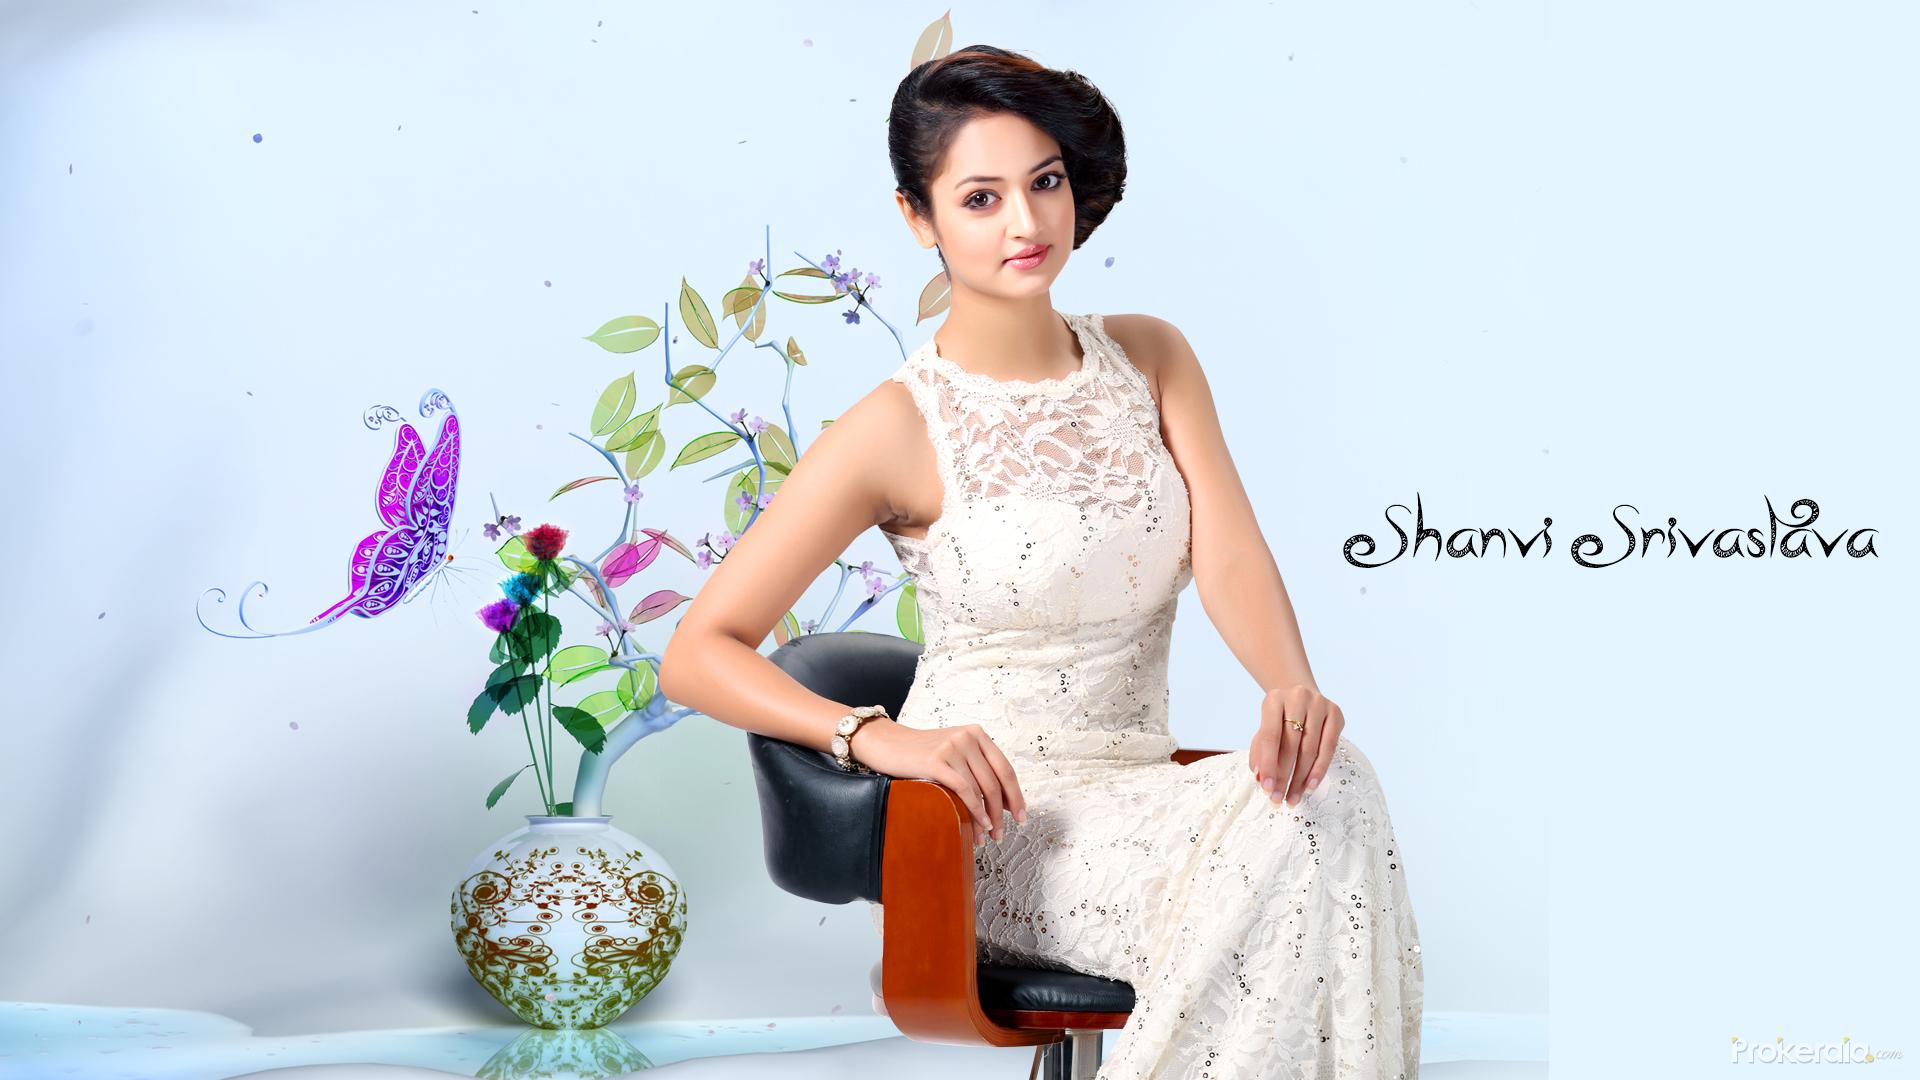 Shanvi Srivastava Latest Wallpapers